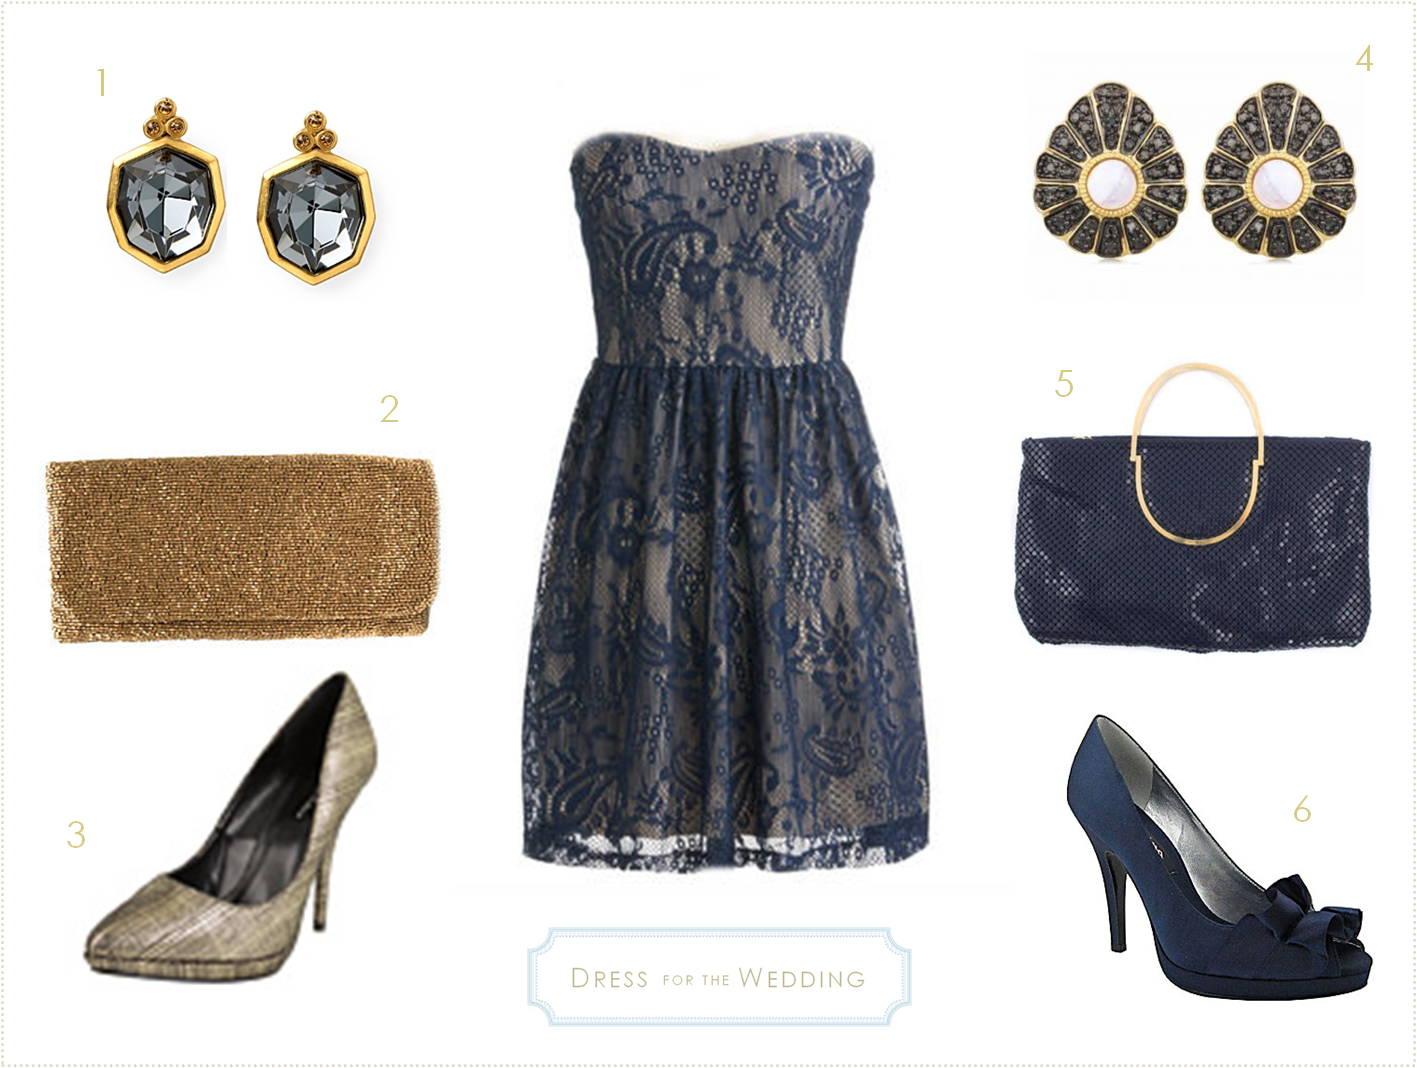 Blue Lace Cocktail Dress for a Wedding | Lace cocktail dresses ...